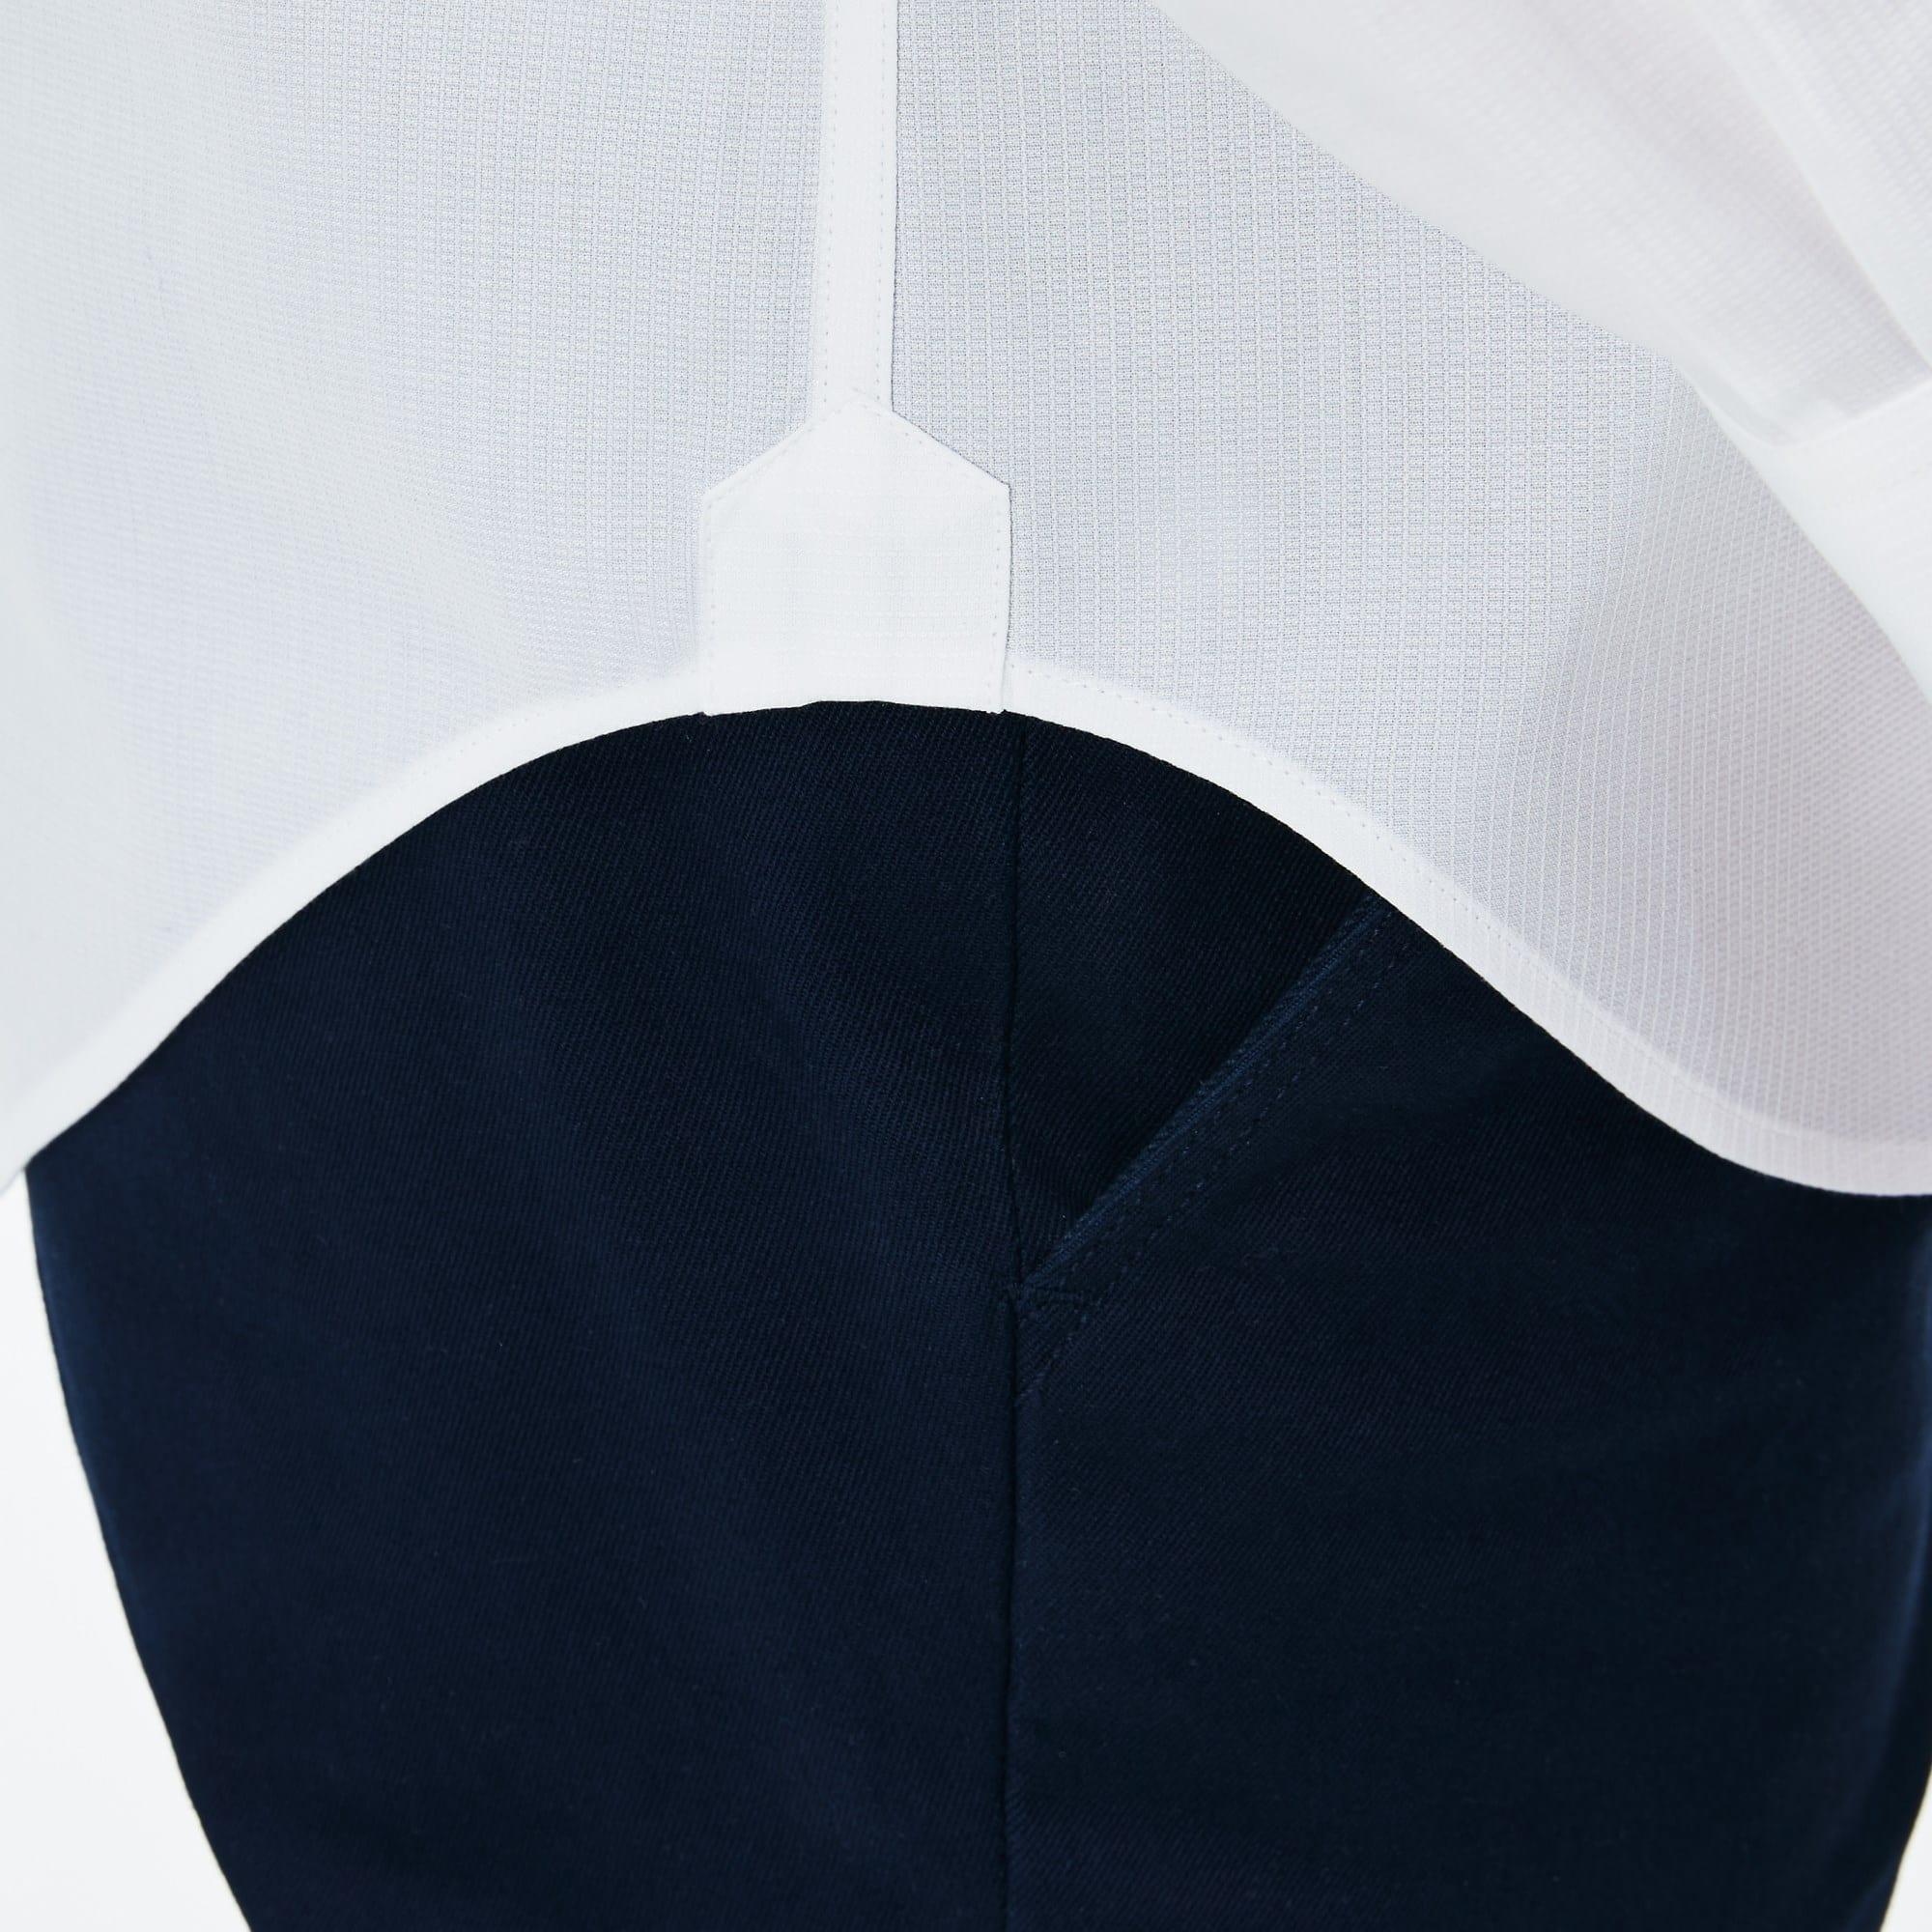 Lacoste - Regular Fit Herren-Hemd aus strukturierter Popeline - 5